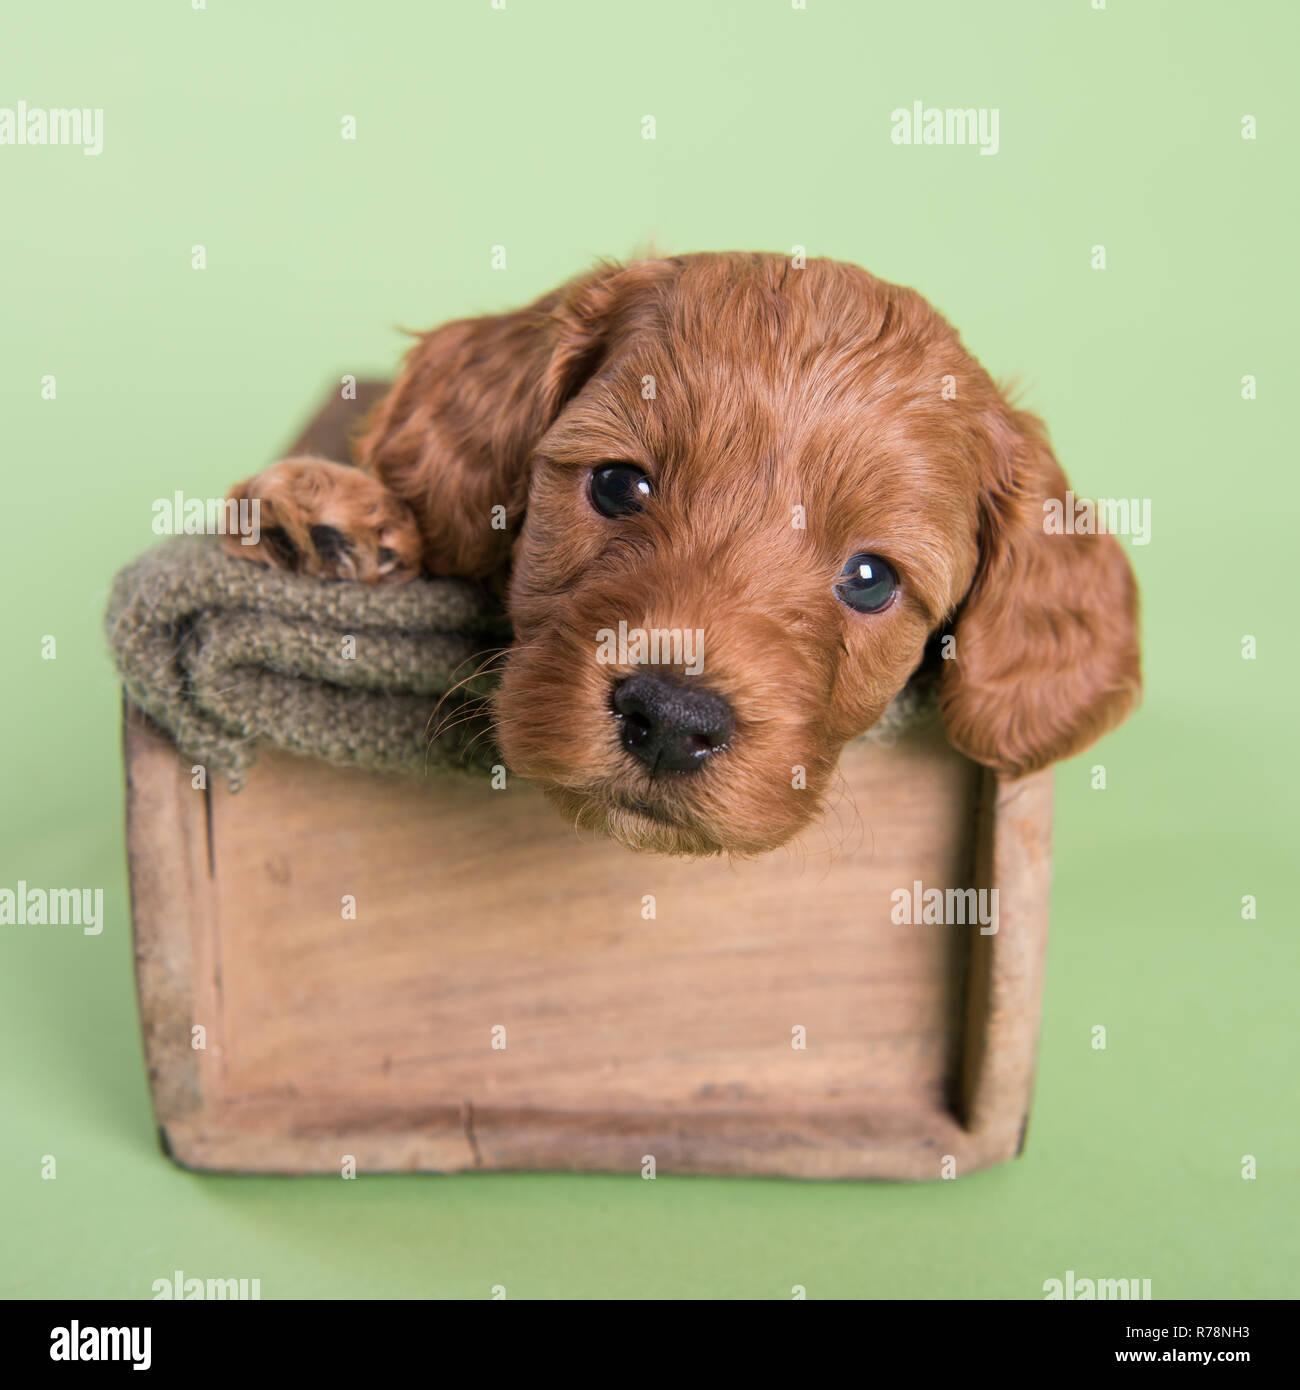 Cockapoo Puppy dog cute professional photograph - Stock Image